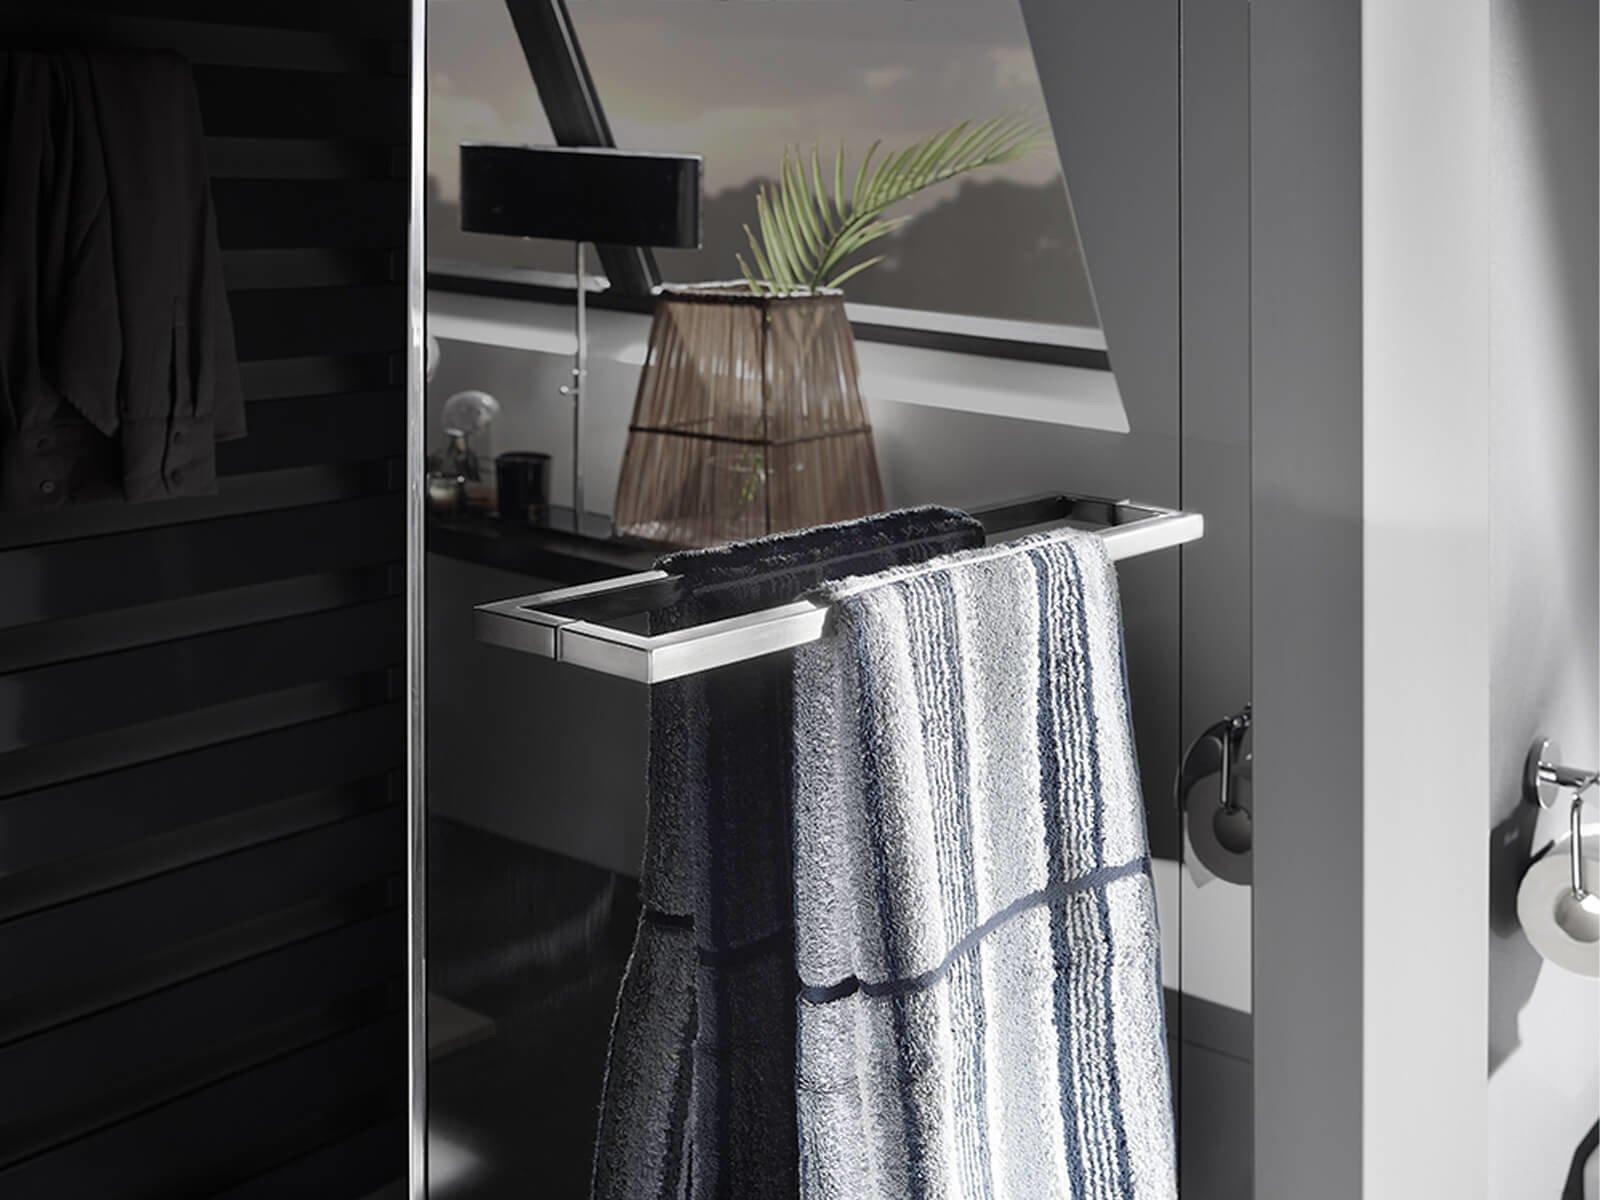 Eckiger Handtuchhalter aus mattem Edelstahl mit Handtuch an dunkelgrauer Duschwand